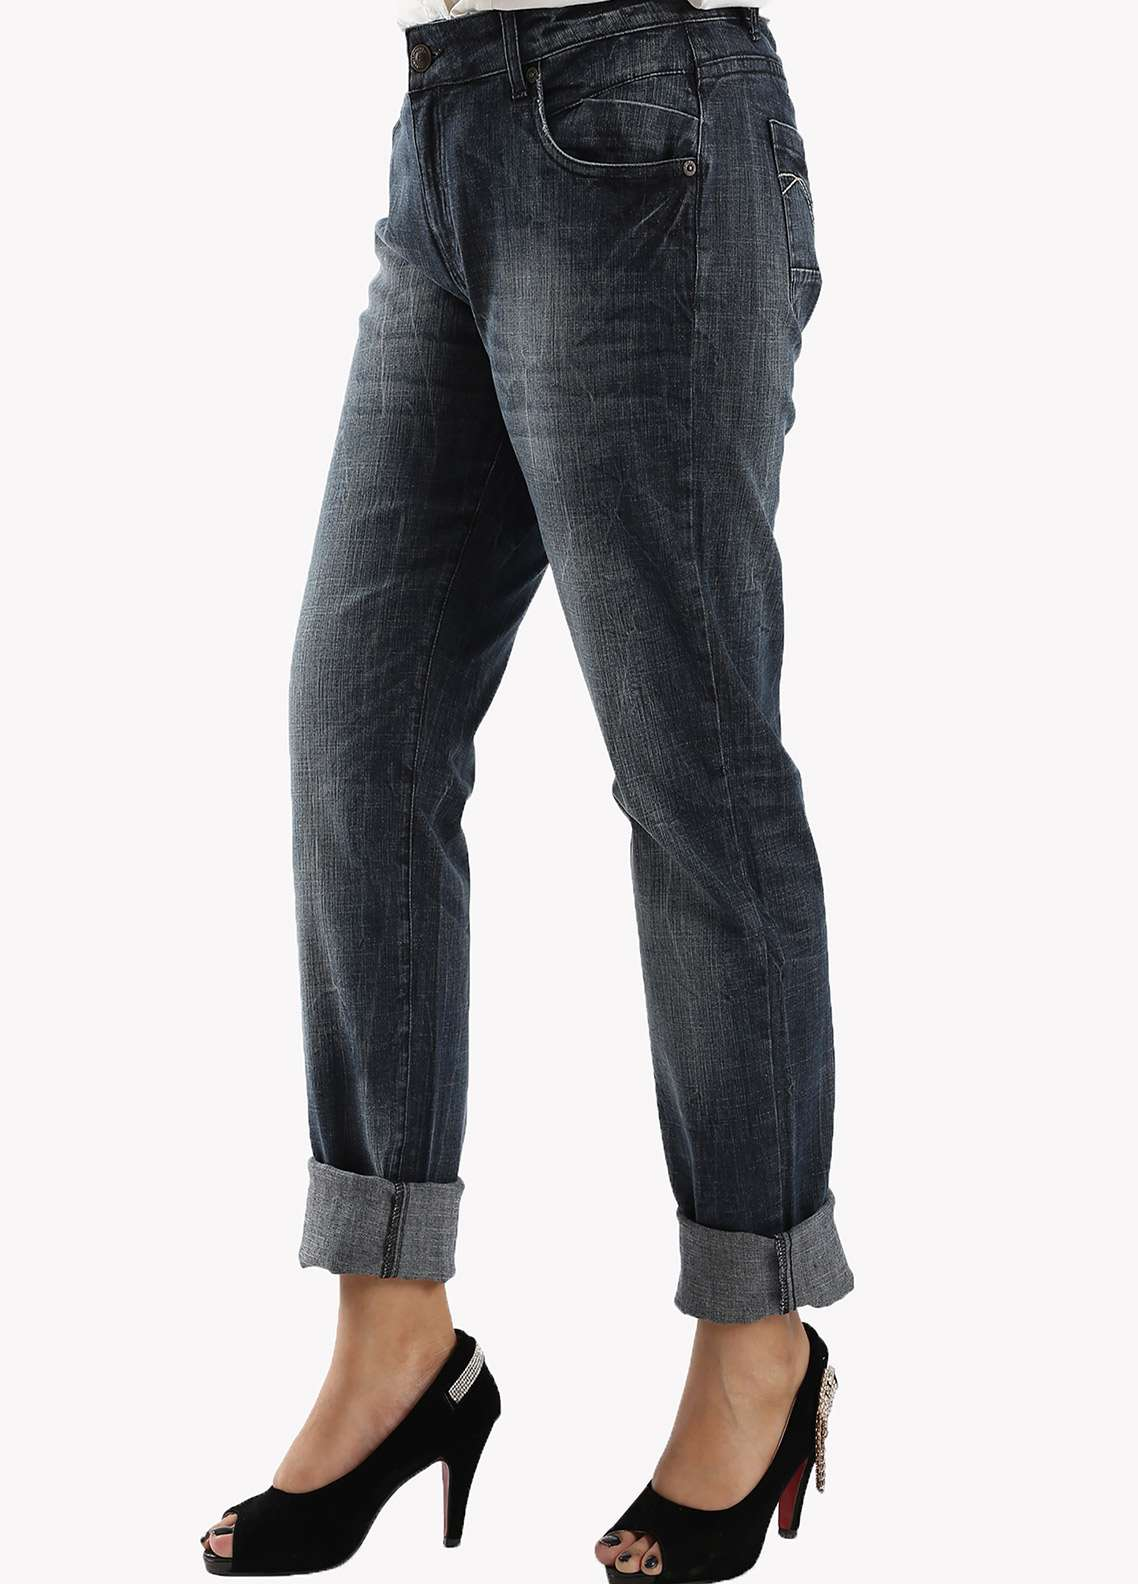 Bien Habille Ladies jeans Raven Black